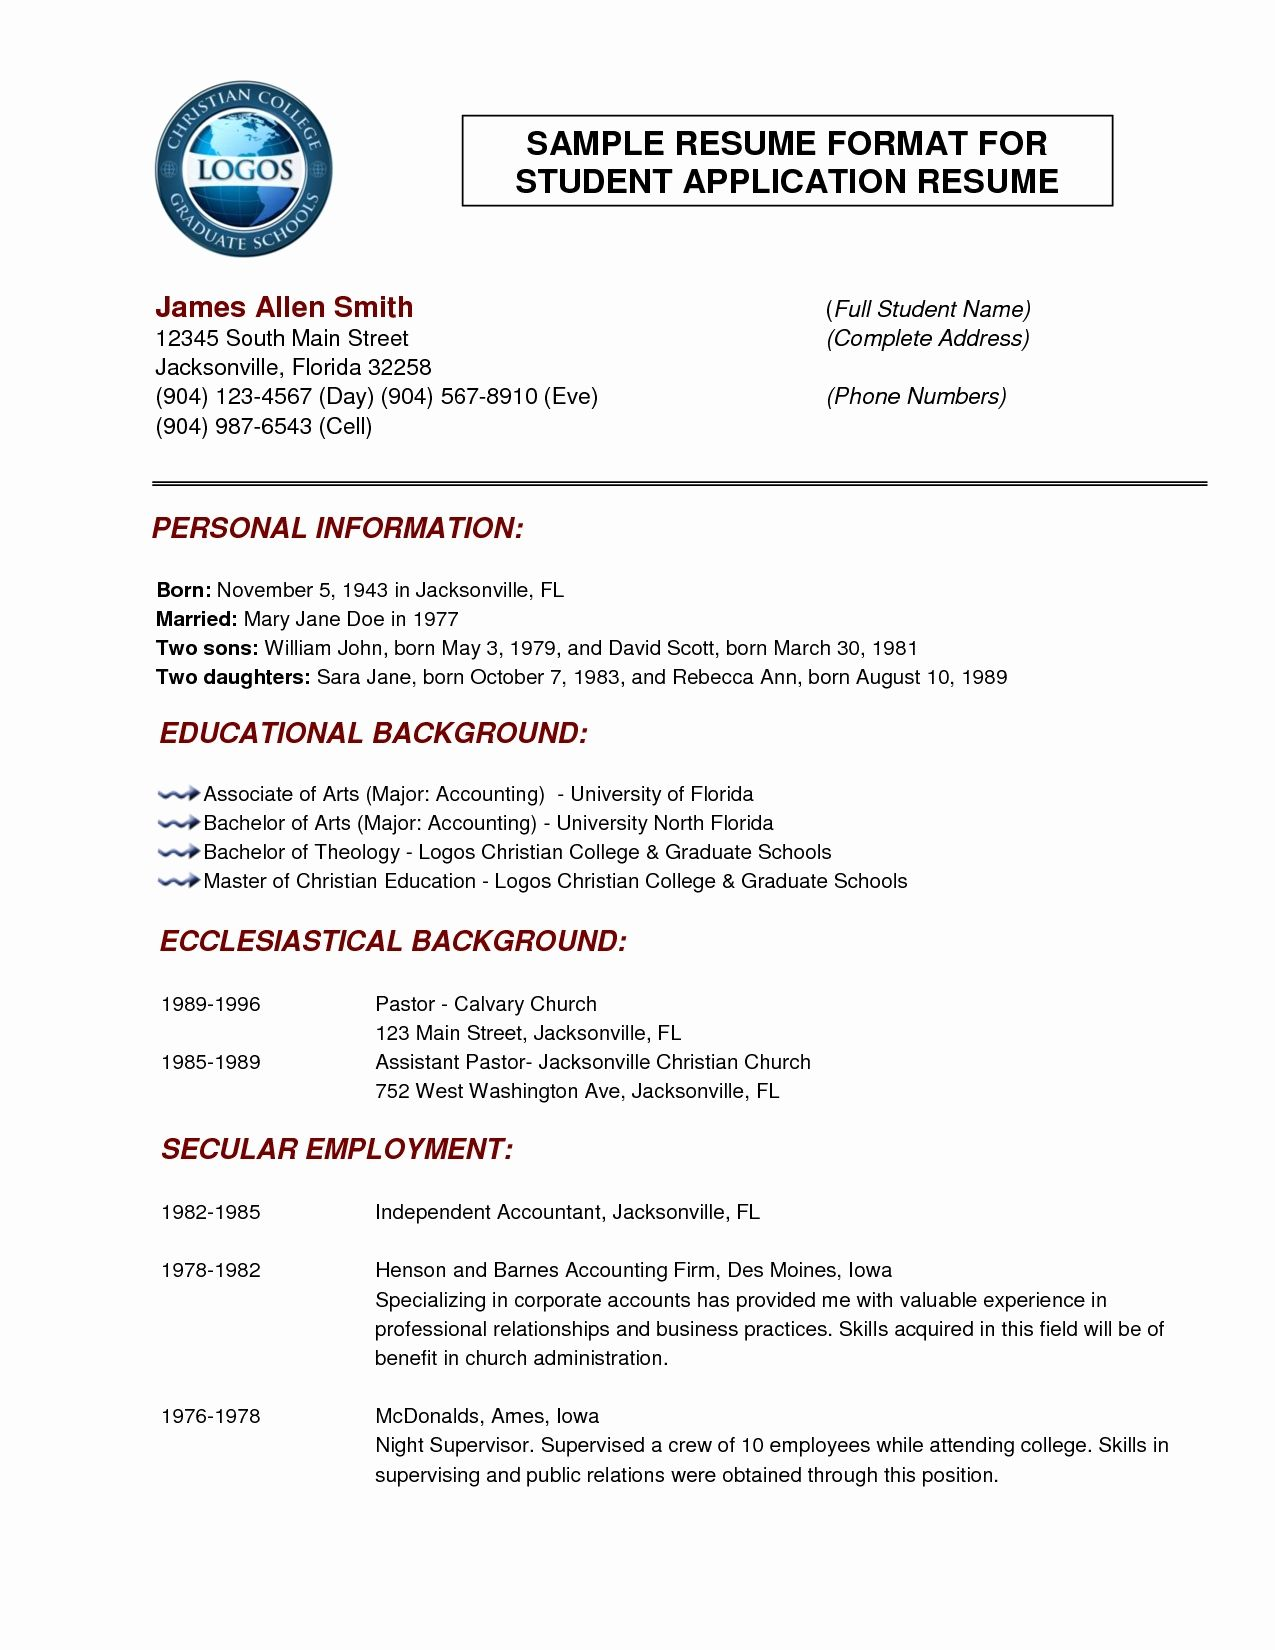 Resume Format Normal Resume Cover Letter Template Cover Letter